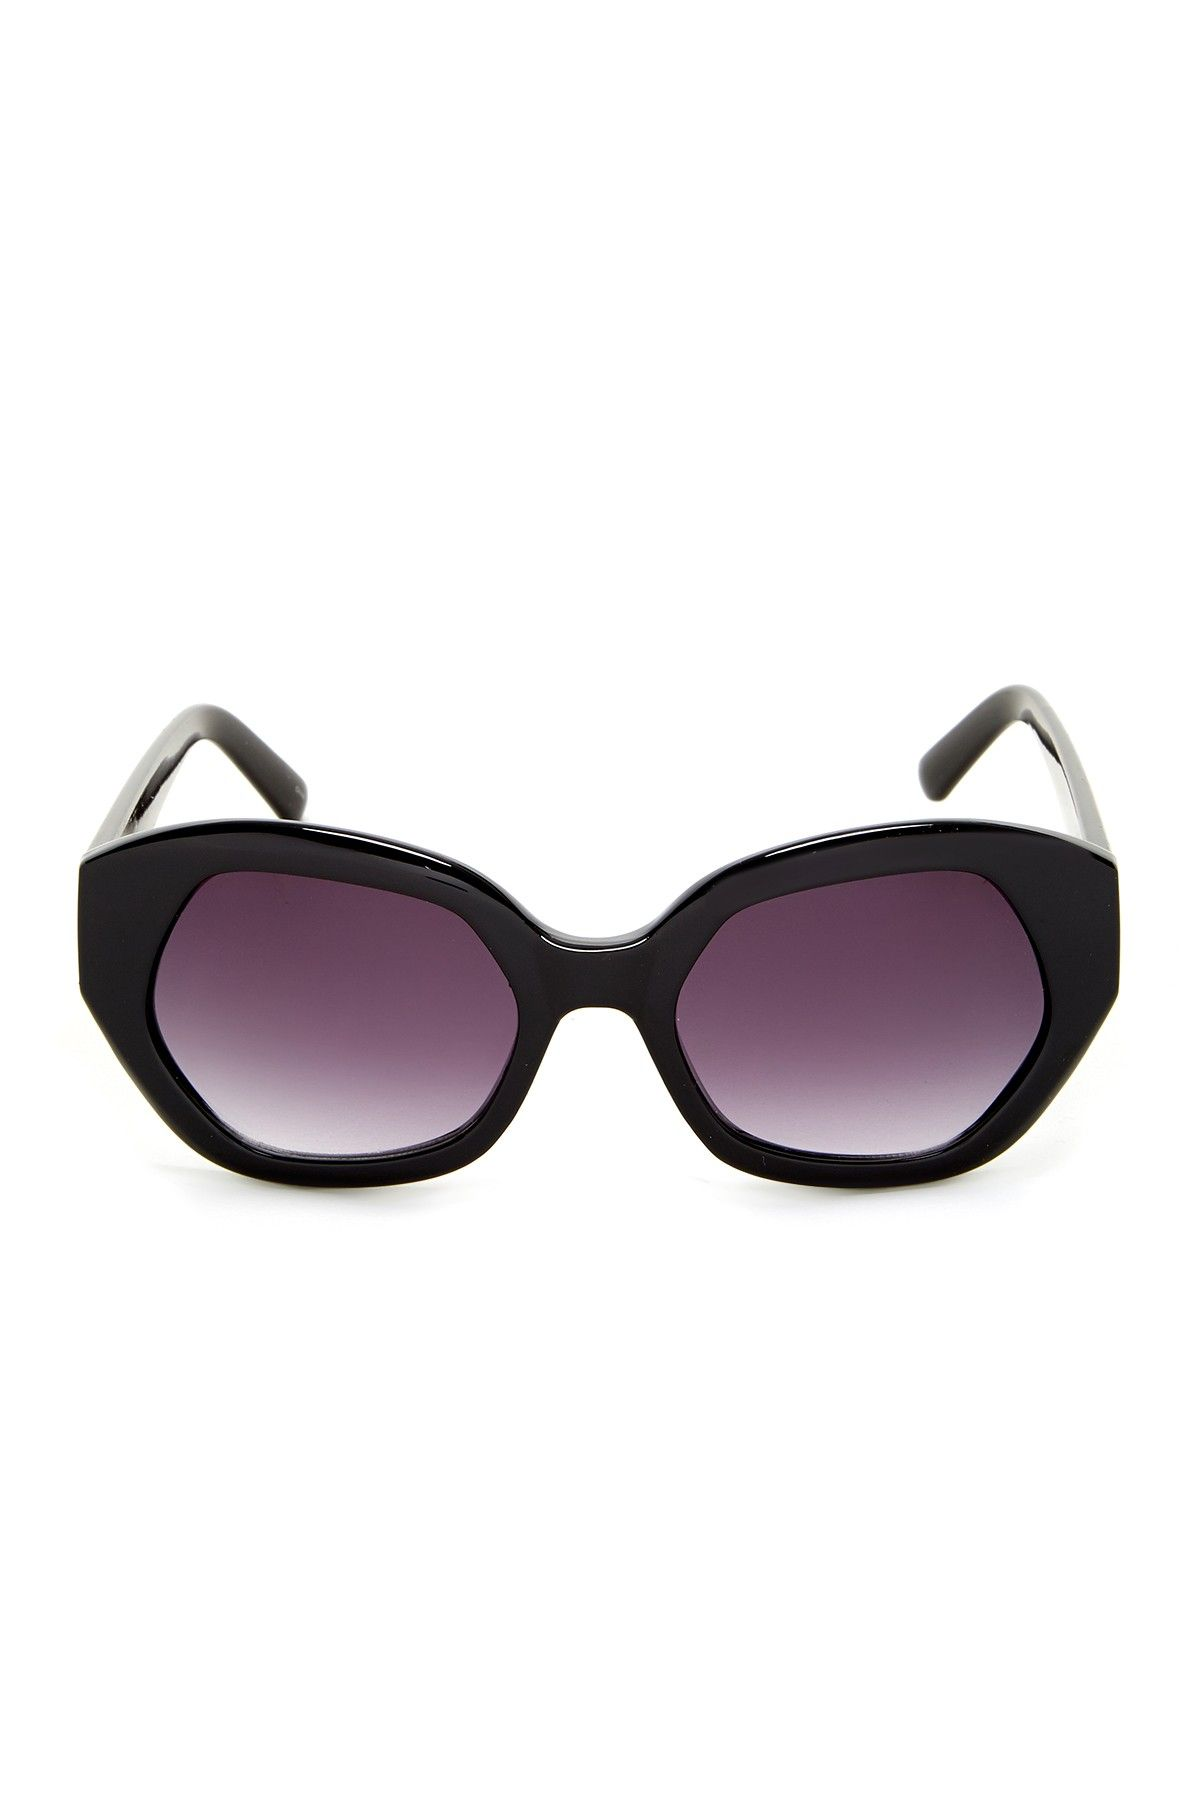 ae209ad00 Steve Madden Oversized Geo Sunglasses Inspiração Criativa, Steve Madden,  Sunnies, Óculos, Estilo